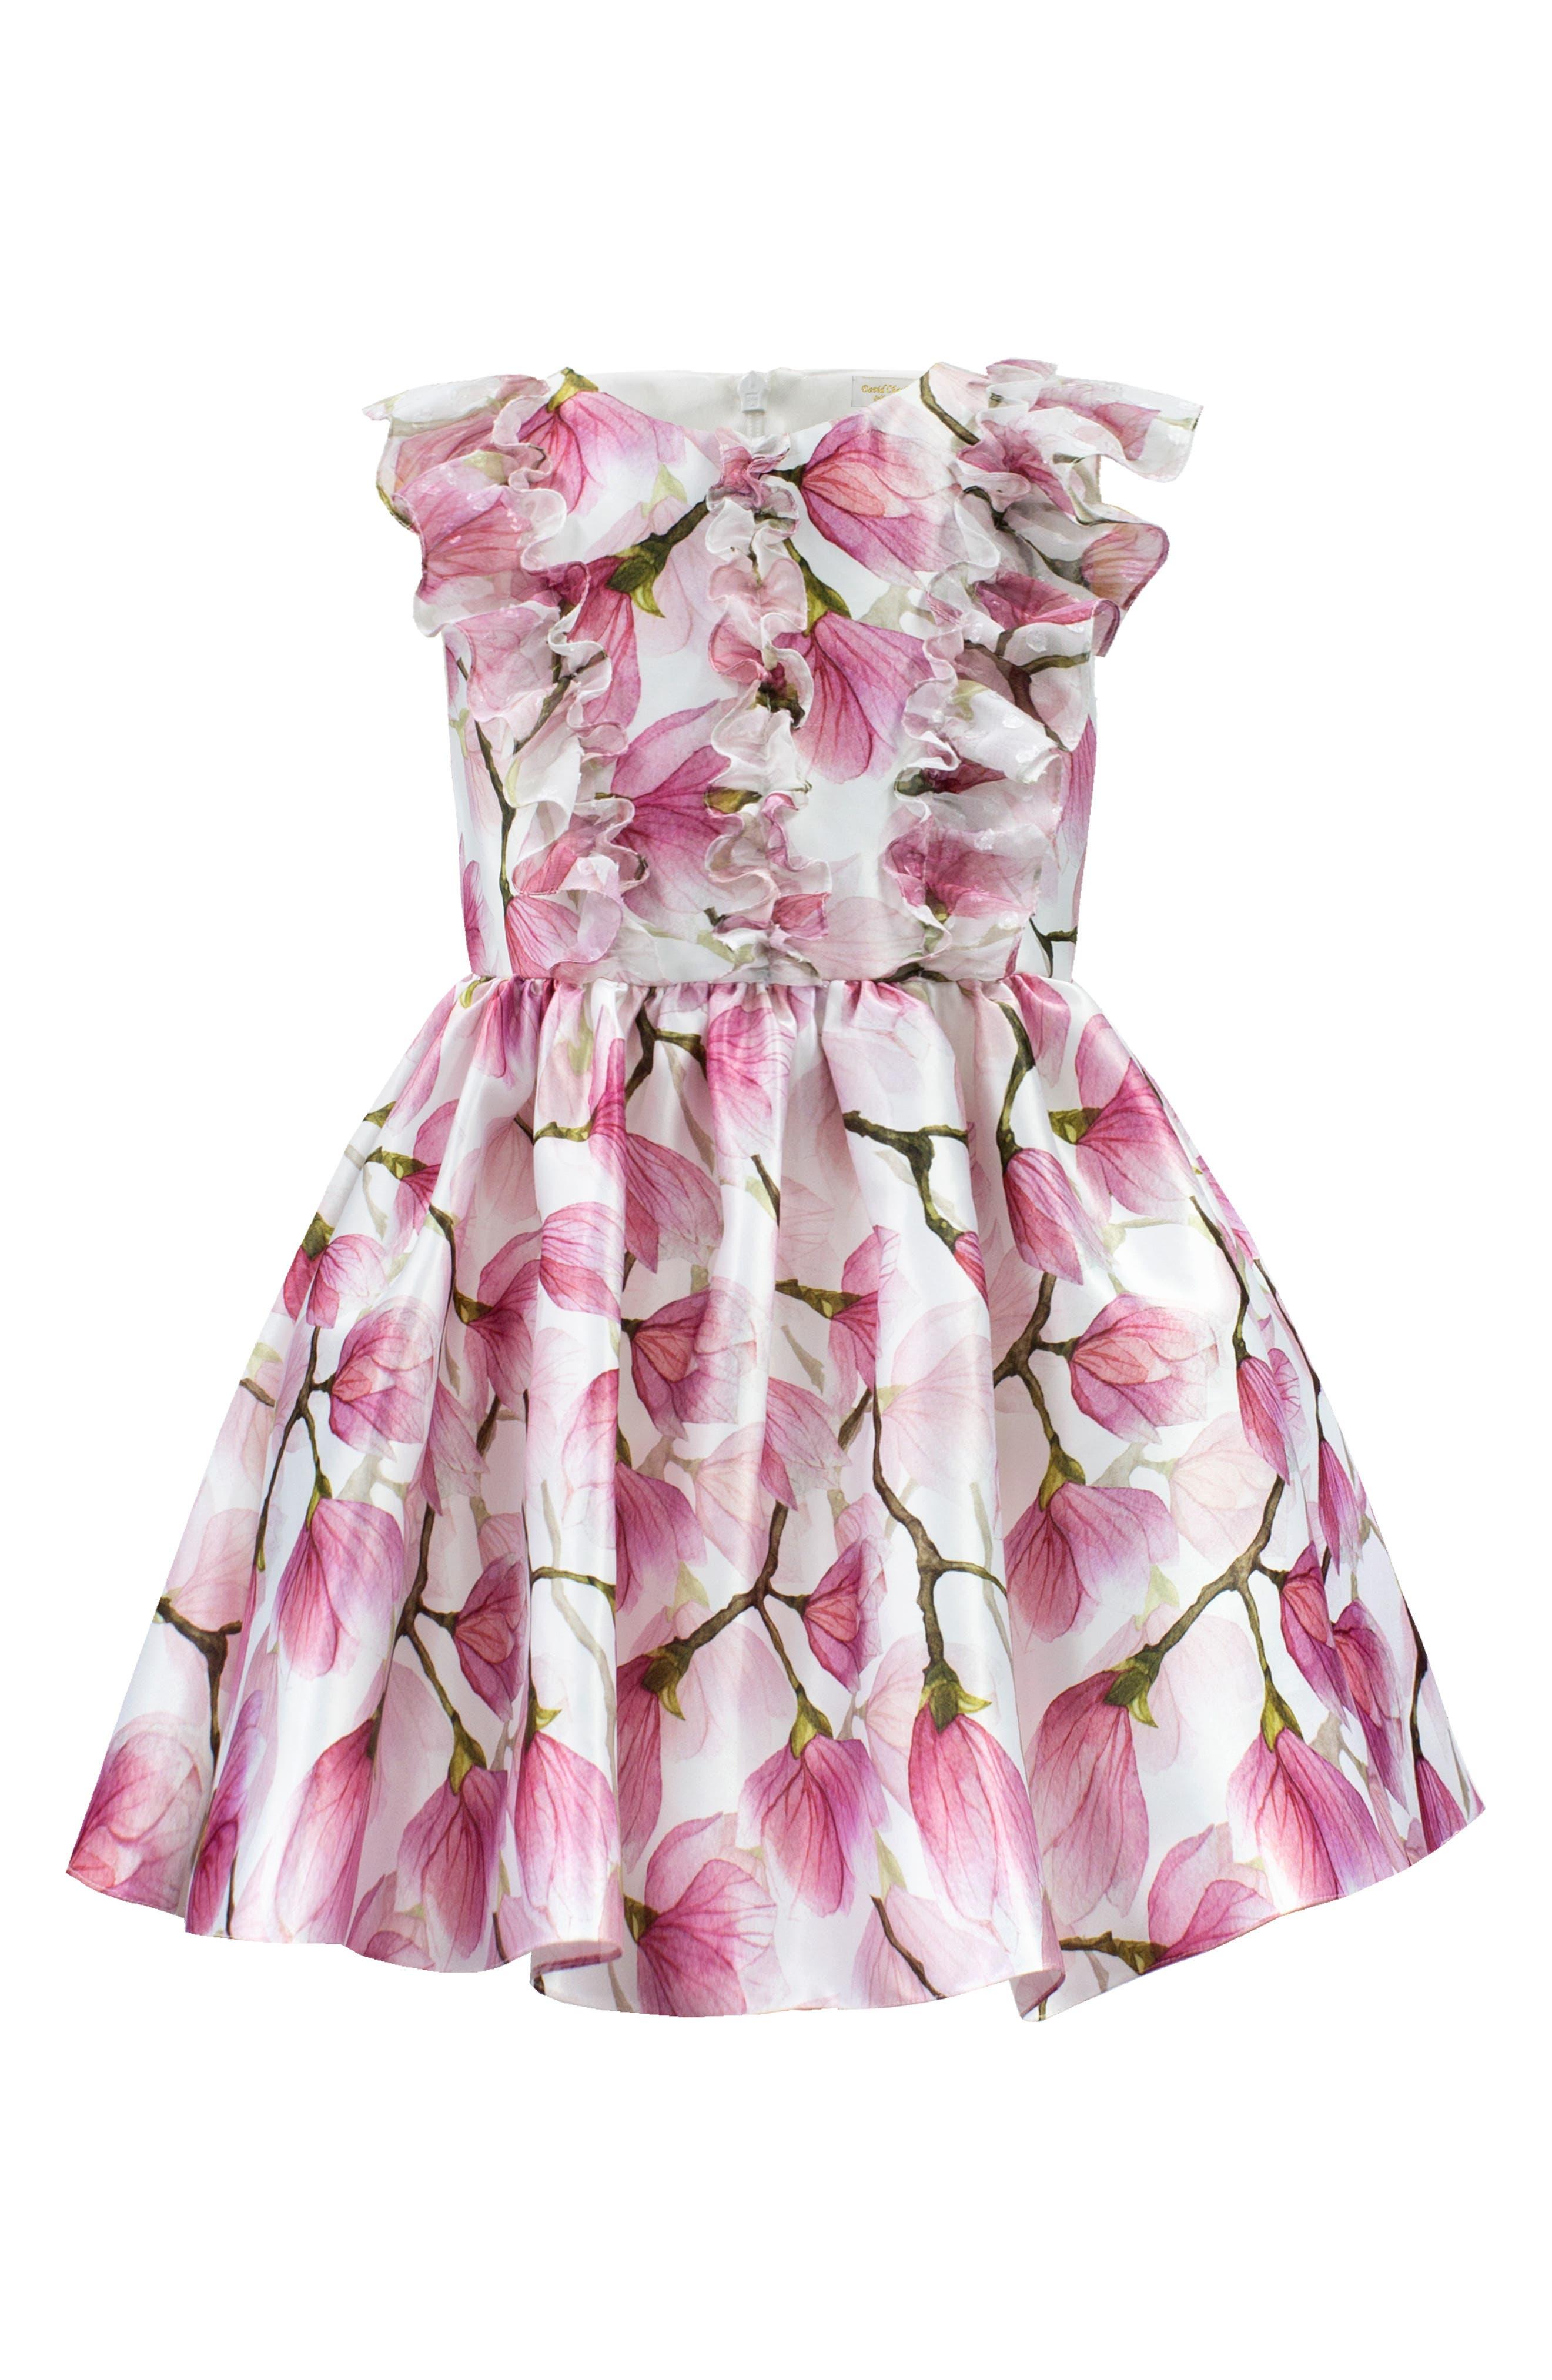 DAVID CHARLES Floral Ruffle Party Dress, Main, color, PINK